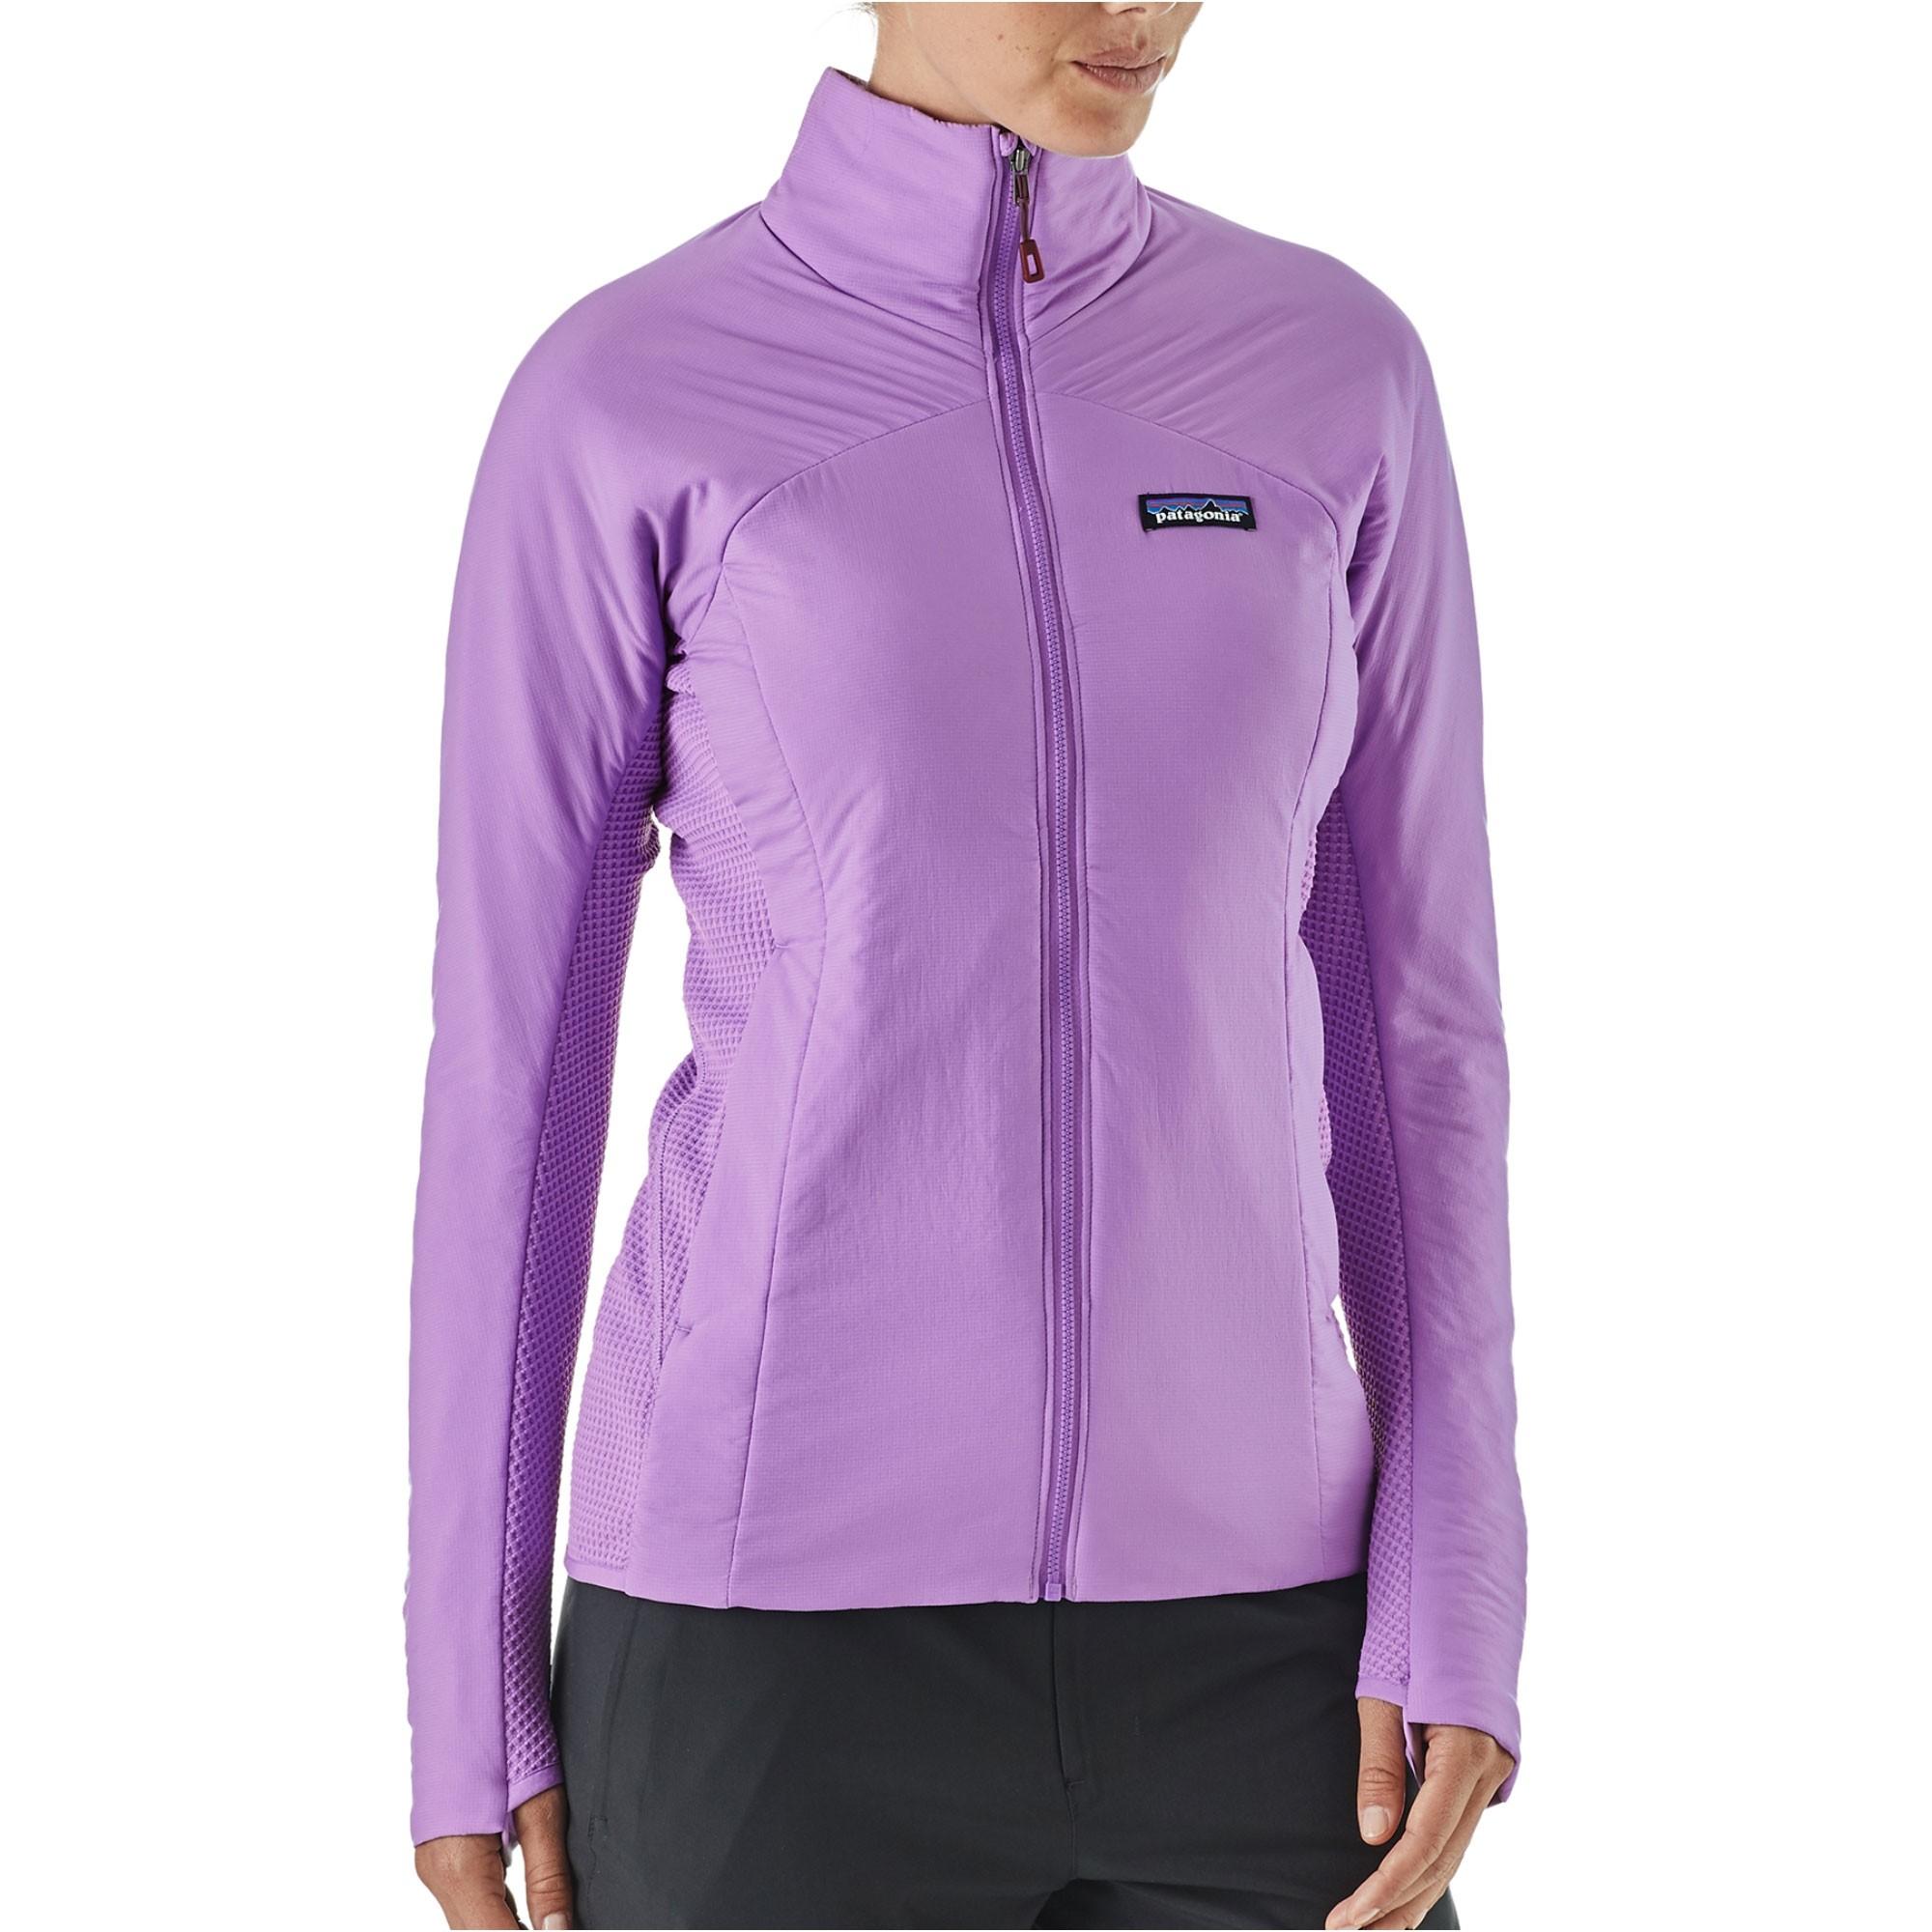 Patagonia-Nano-Air-Light-Hybrid-Jacket-Womens-Light-Acai-OM1-S18